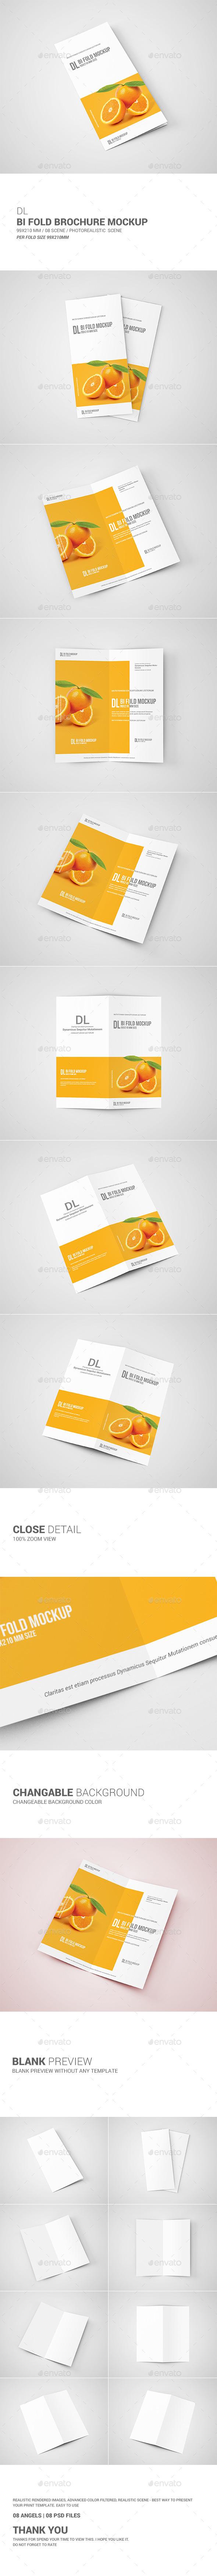 GraphicRiver DL Bi-Fold Brochure Mockup 11098037